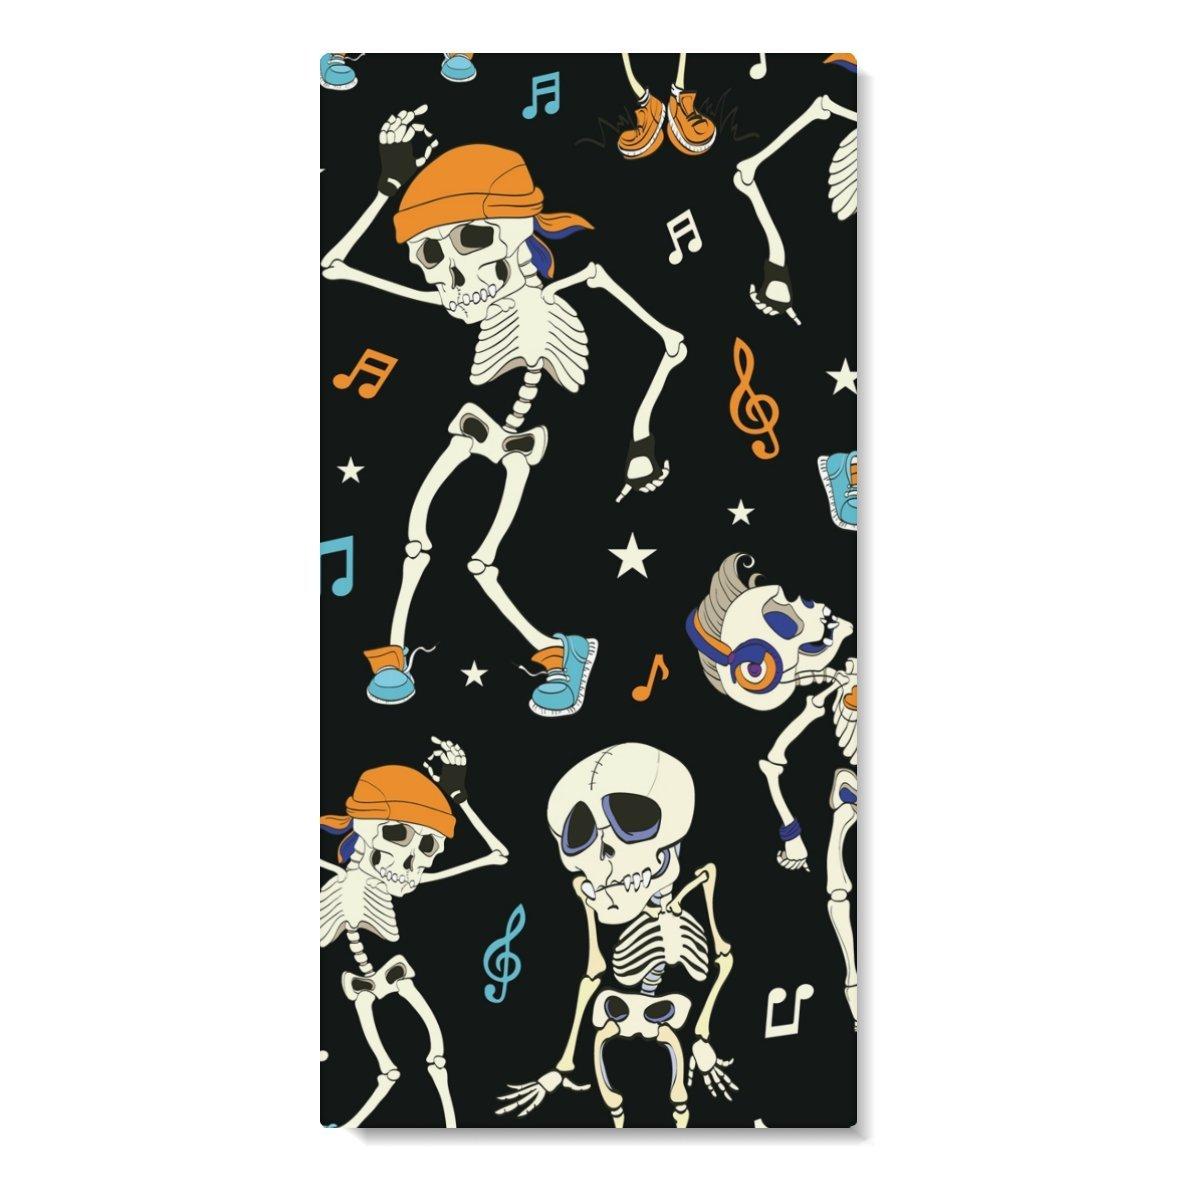 DEYYA Skull Dance Music Travel Beach Bath Towel 74'' x 37'',Lightweight Absorbent Fast Dry Oversized Towels Blanket Mat Perfect for Sports Bath Swim Camping Yoga